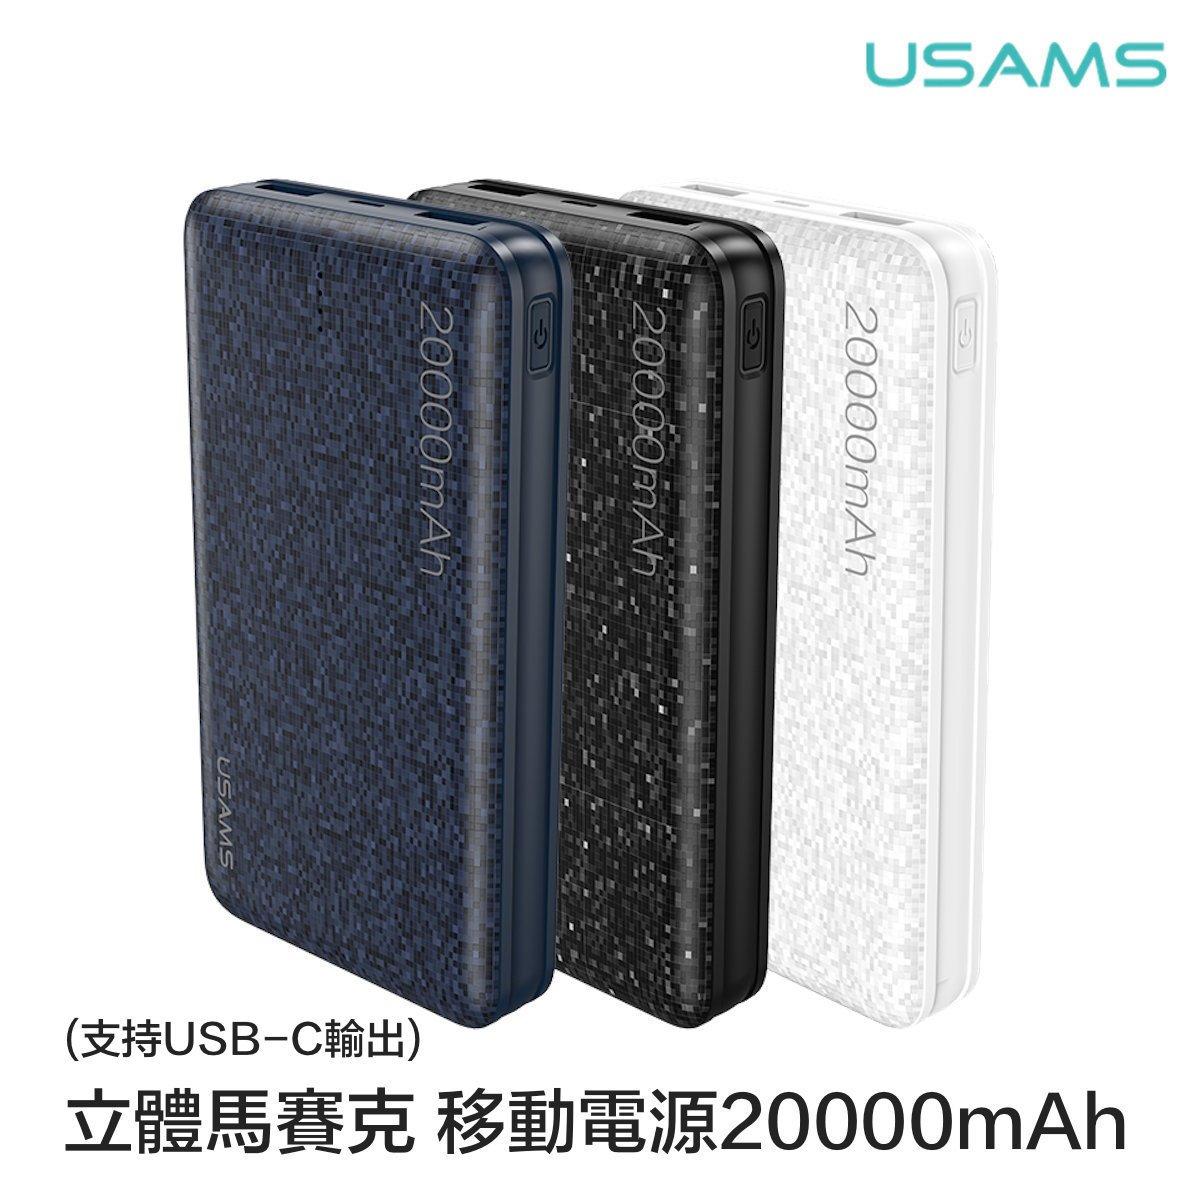 PowerBank USAMS US-CD32 20000mAh, blue